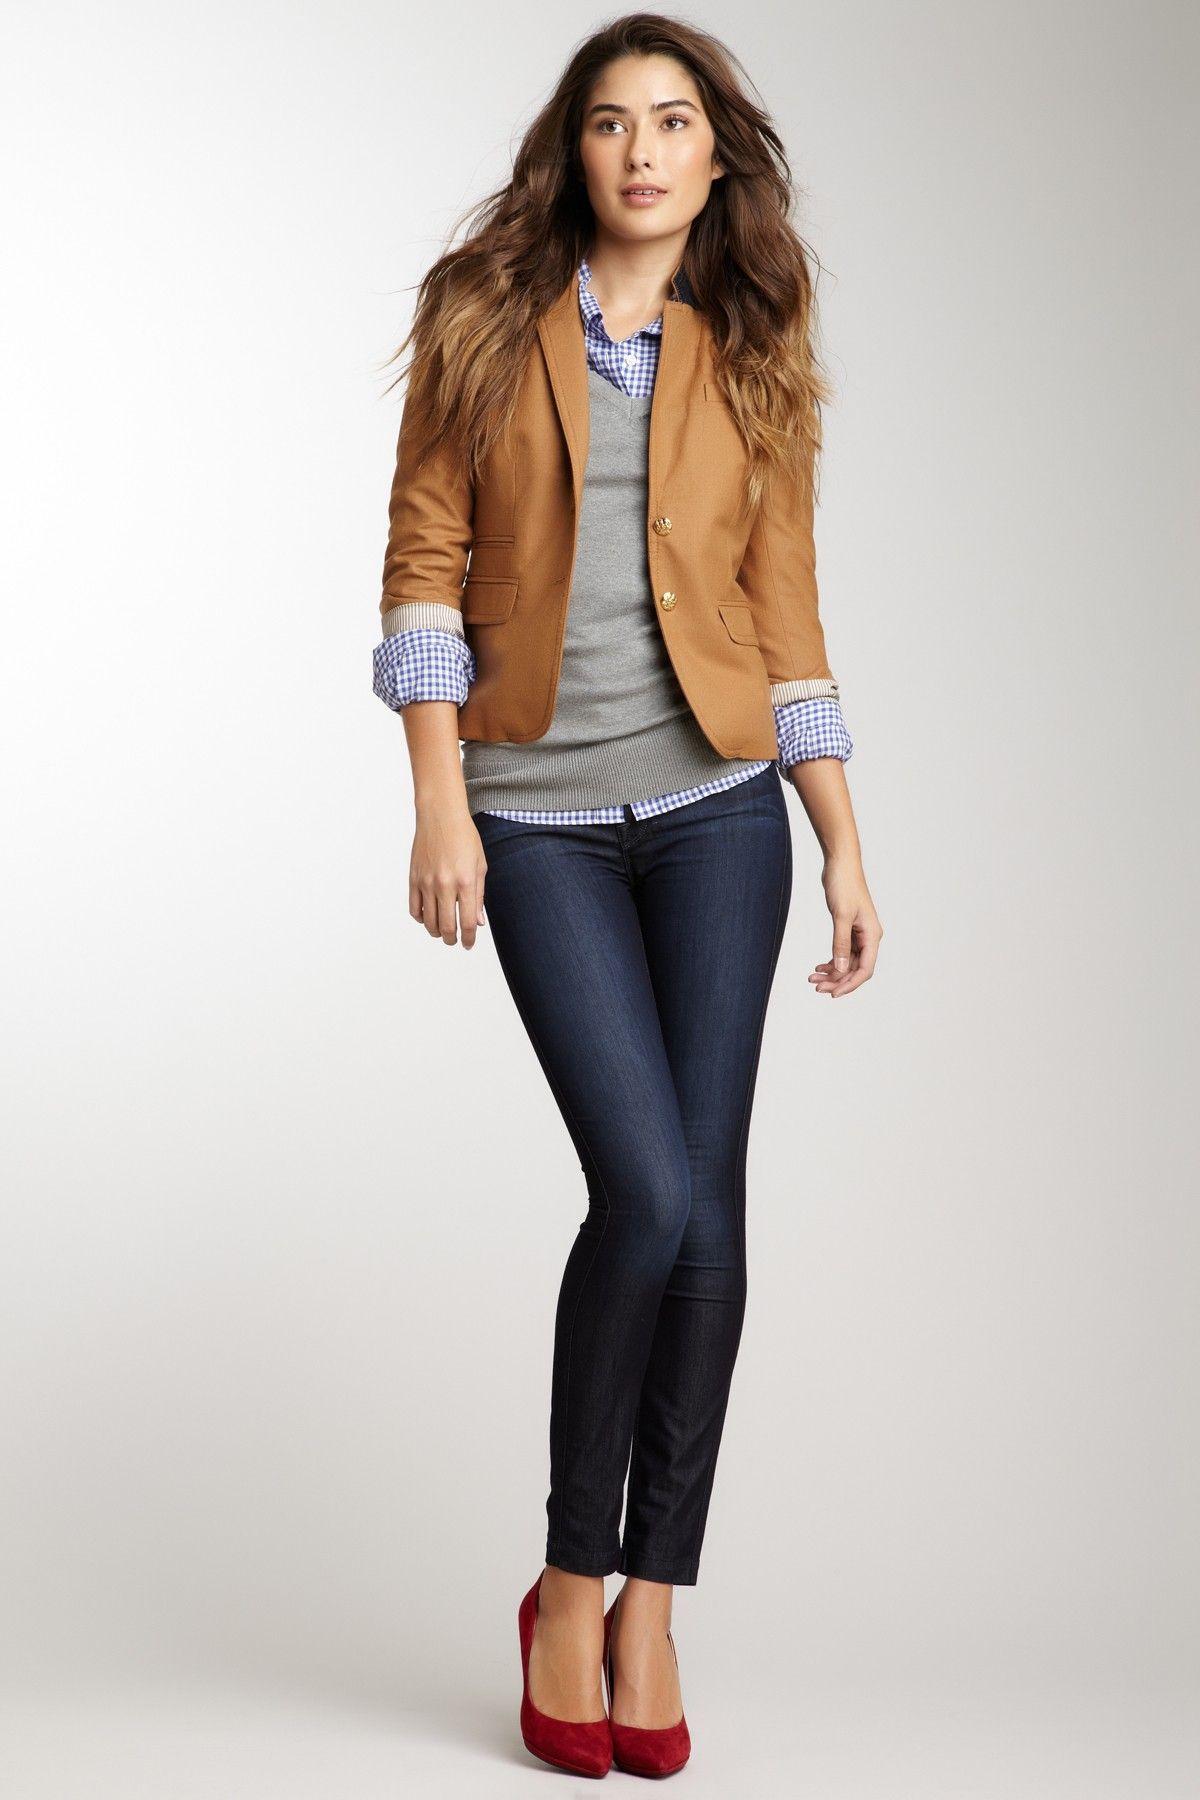 3af278e3ab8 Business casual work outfit- Camel blazer